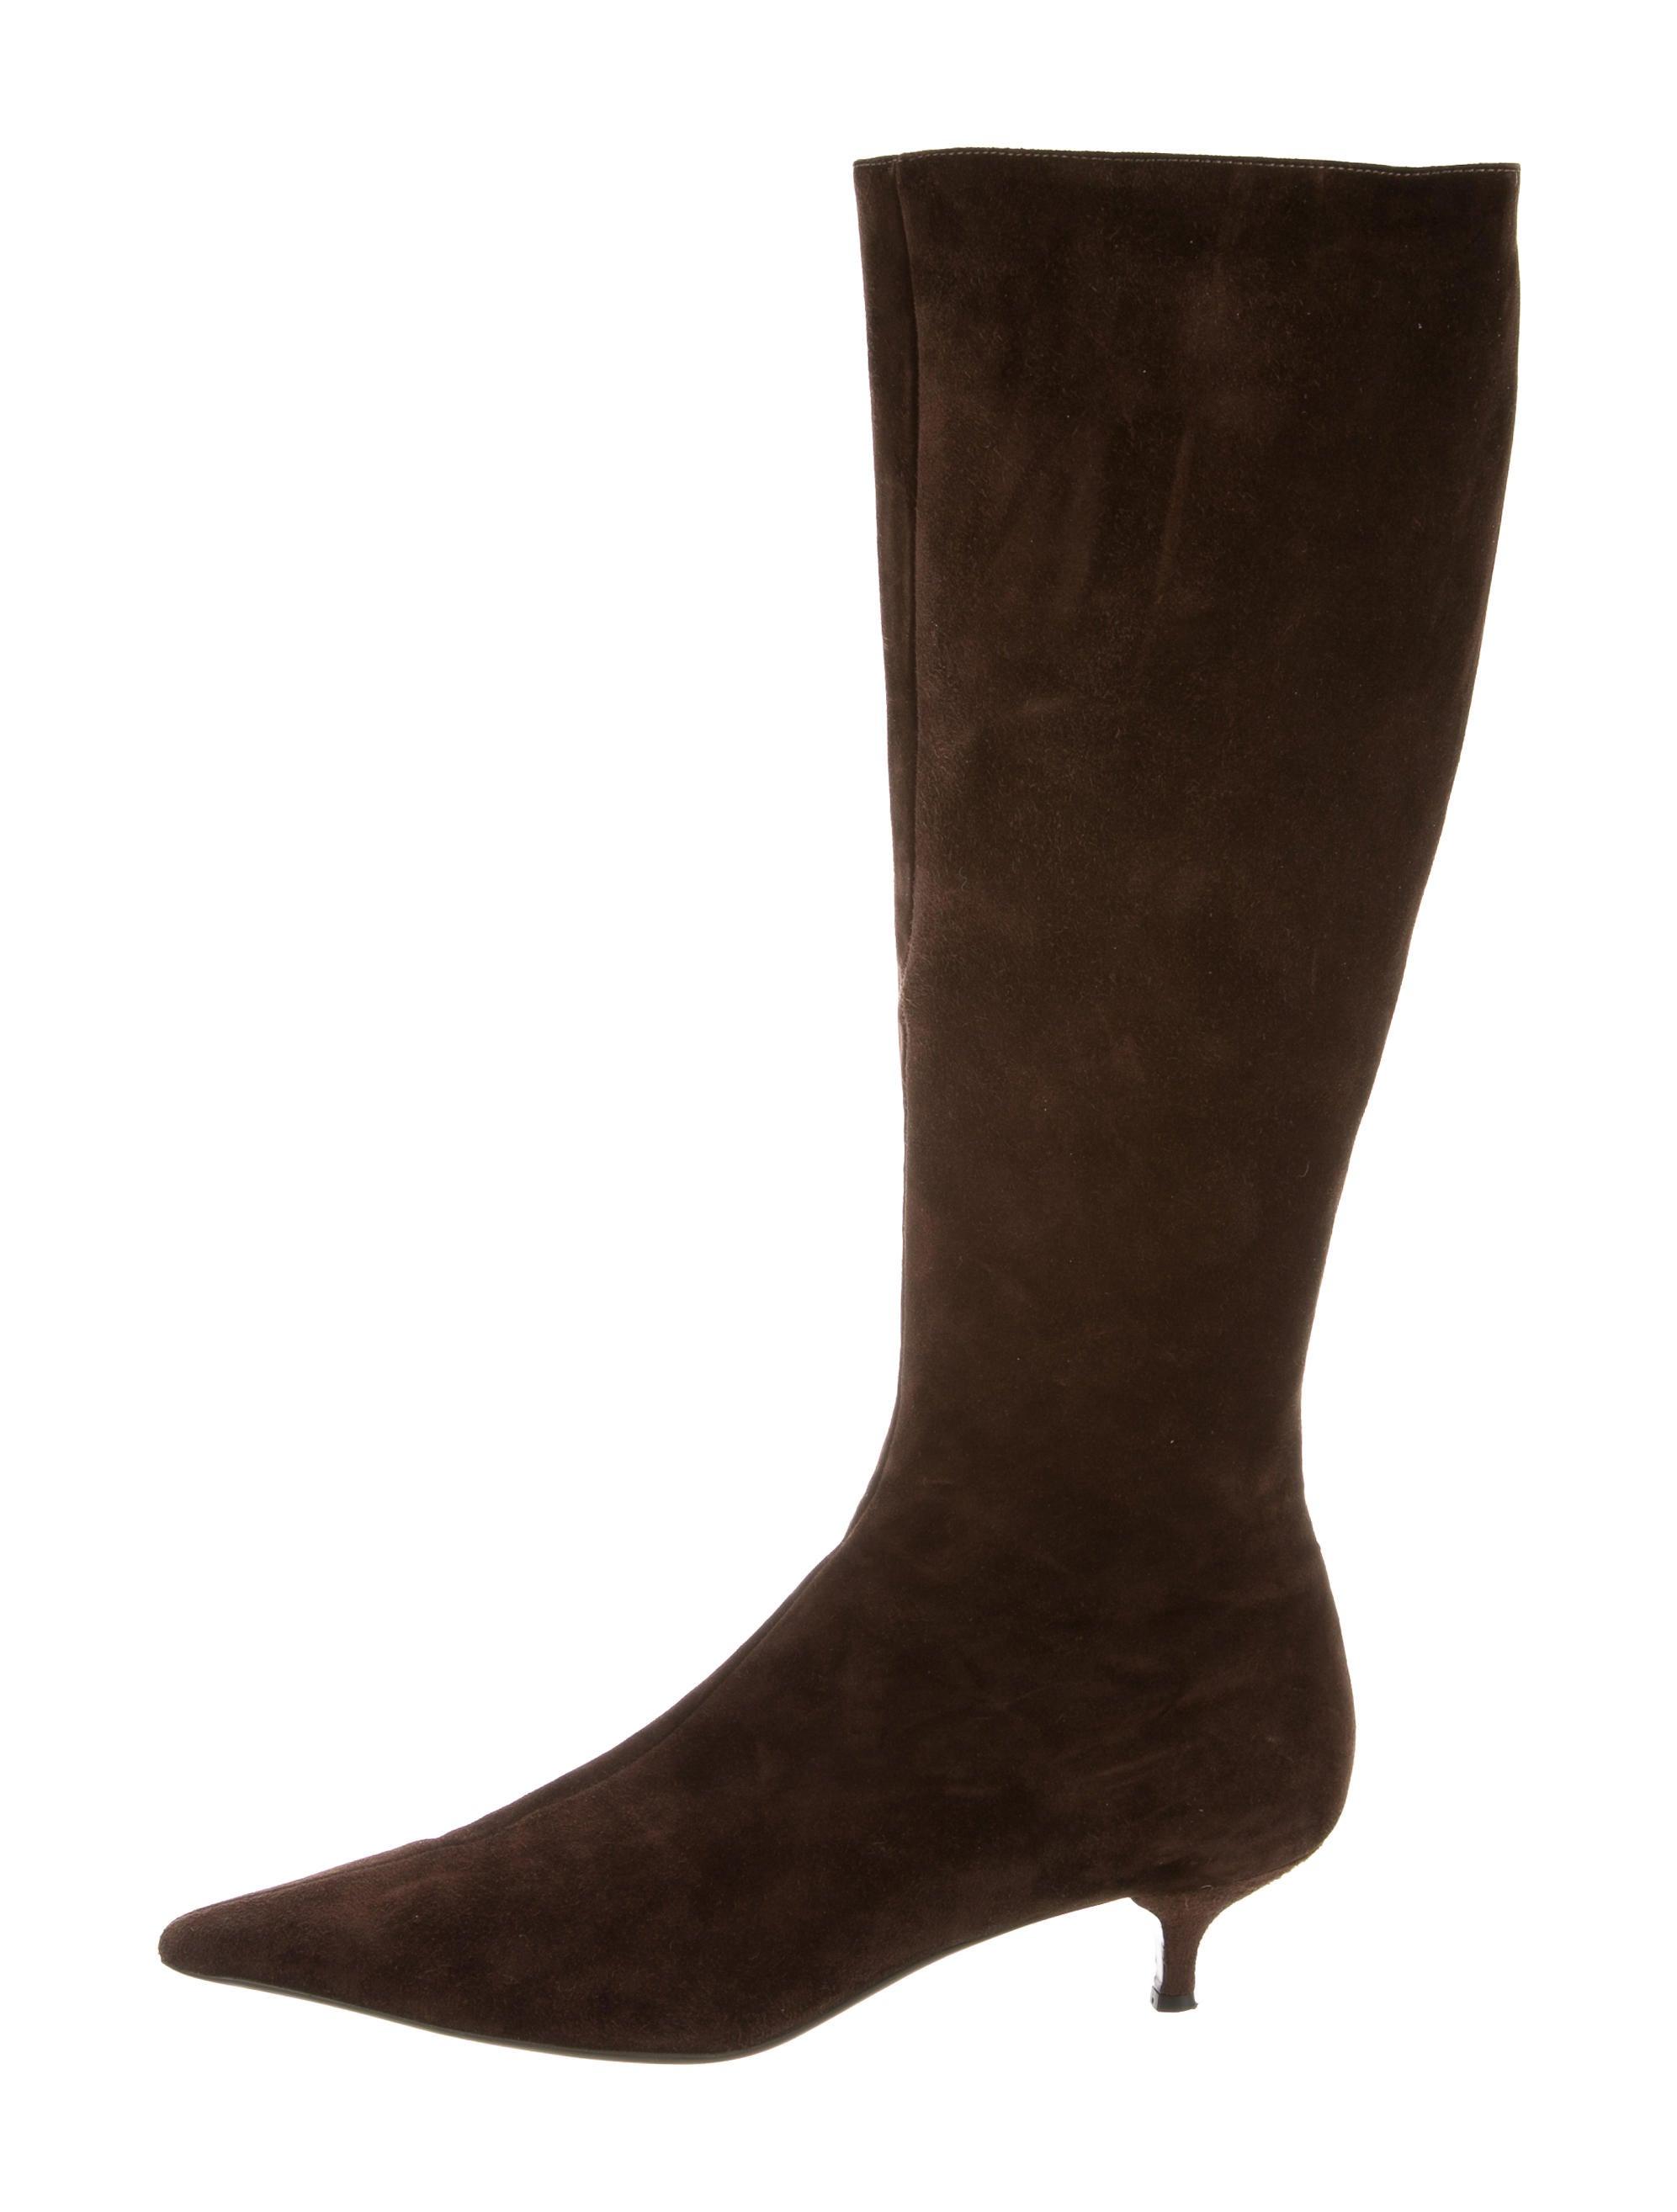 prada suede knee high boots shoes pra164865 the realreal